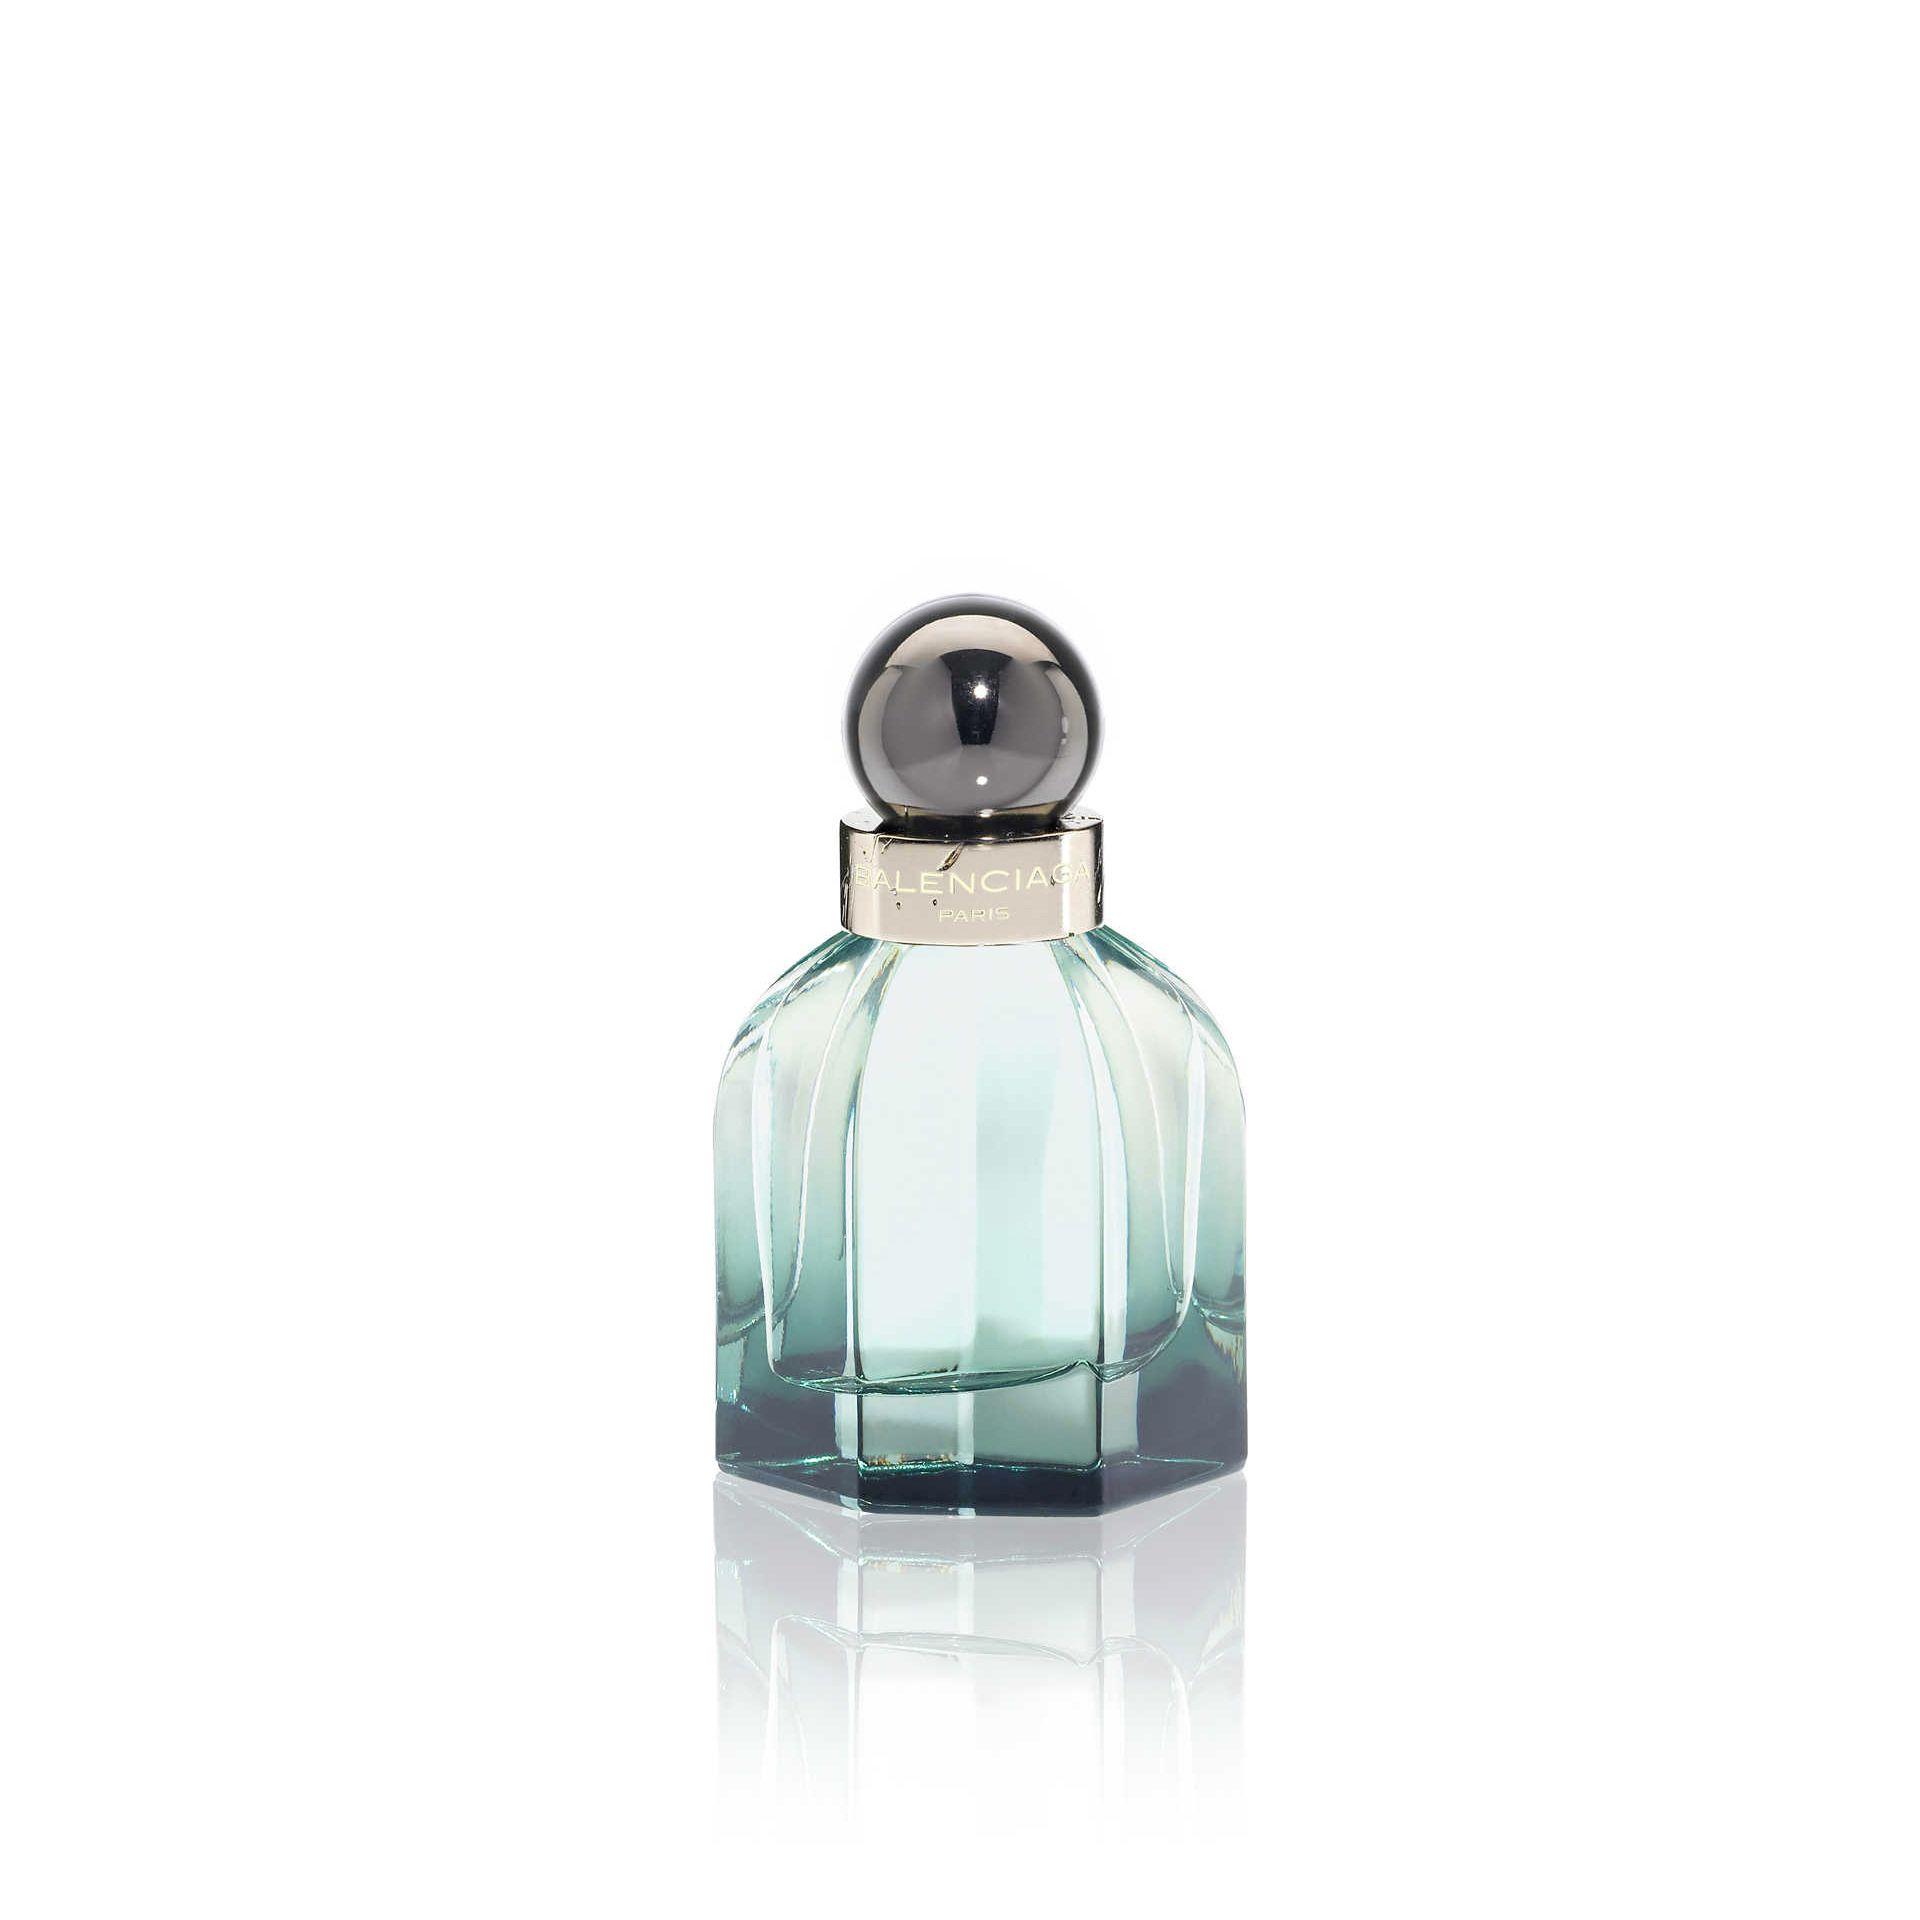 BALENCIAGA Balenciaga L'Essence Eau De Parfum 30Ml Fragrance D f